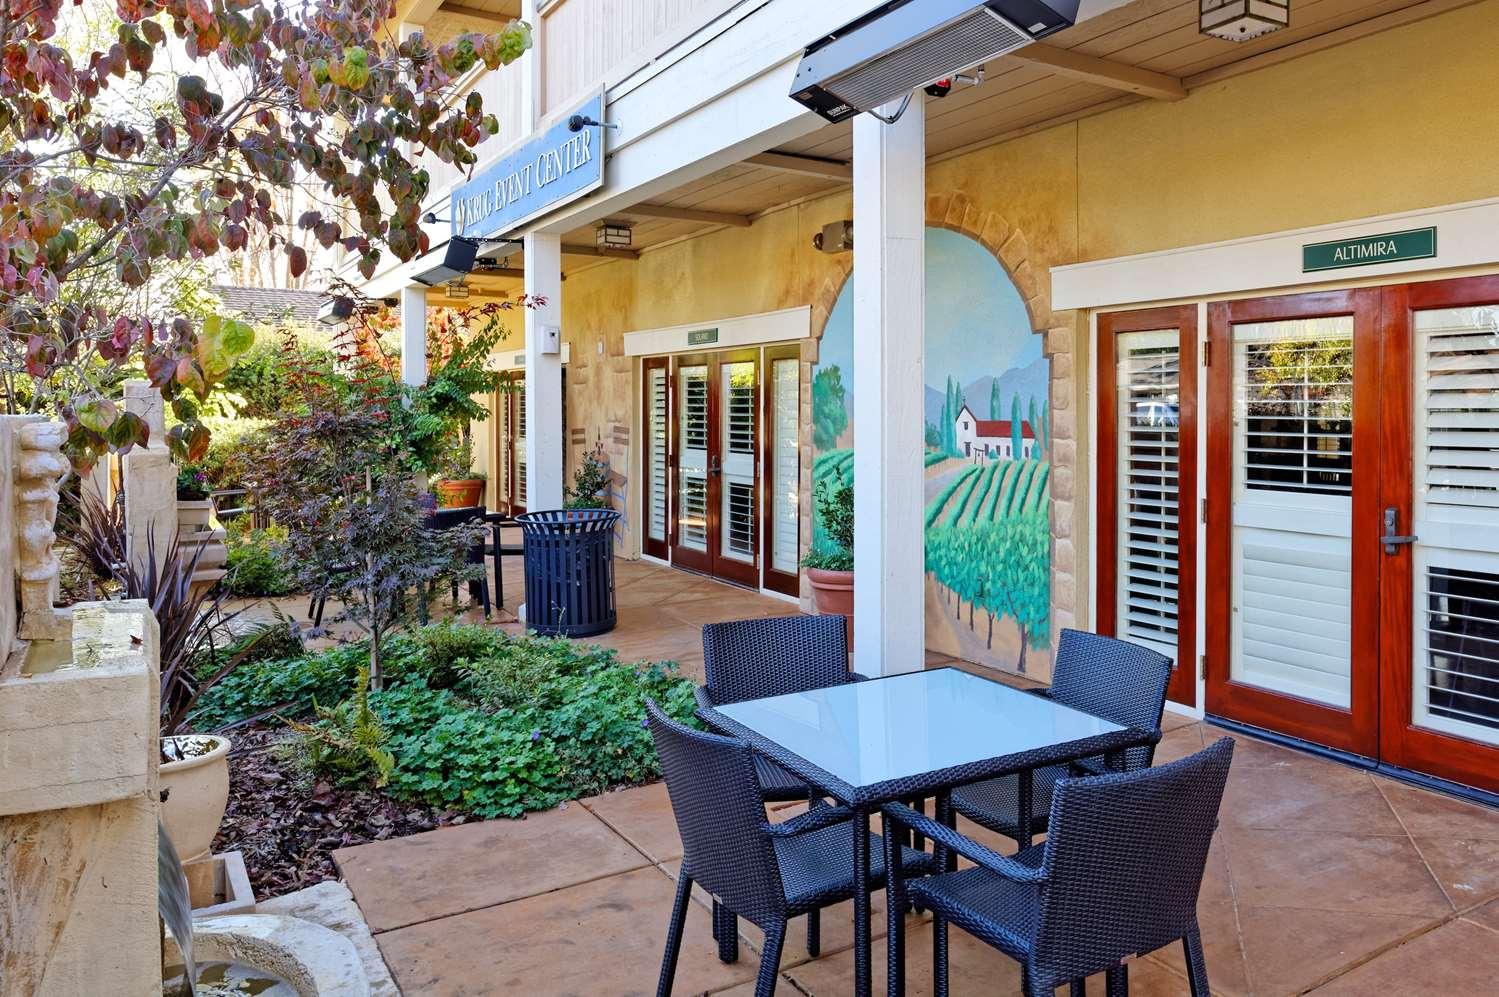 proam - Best Western Sonoma Valley Inn & Krug Event Center